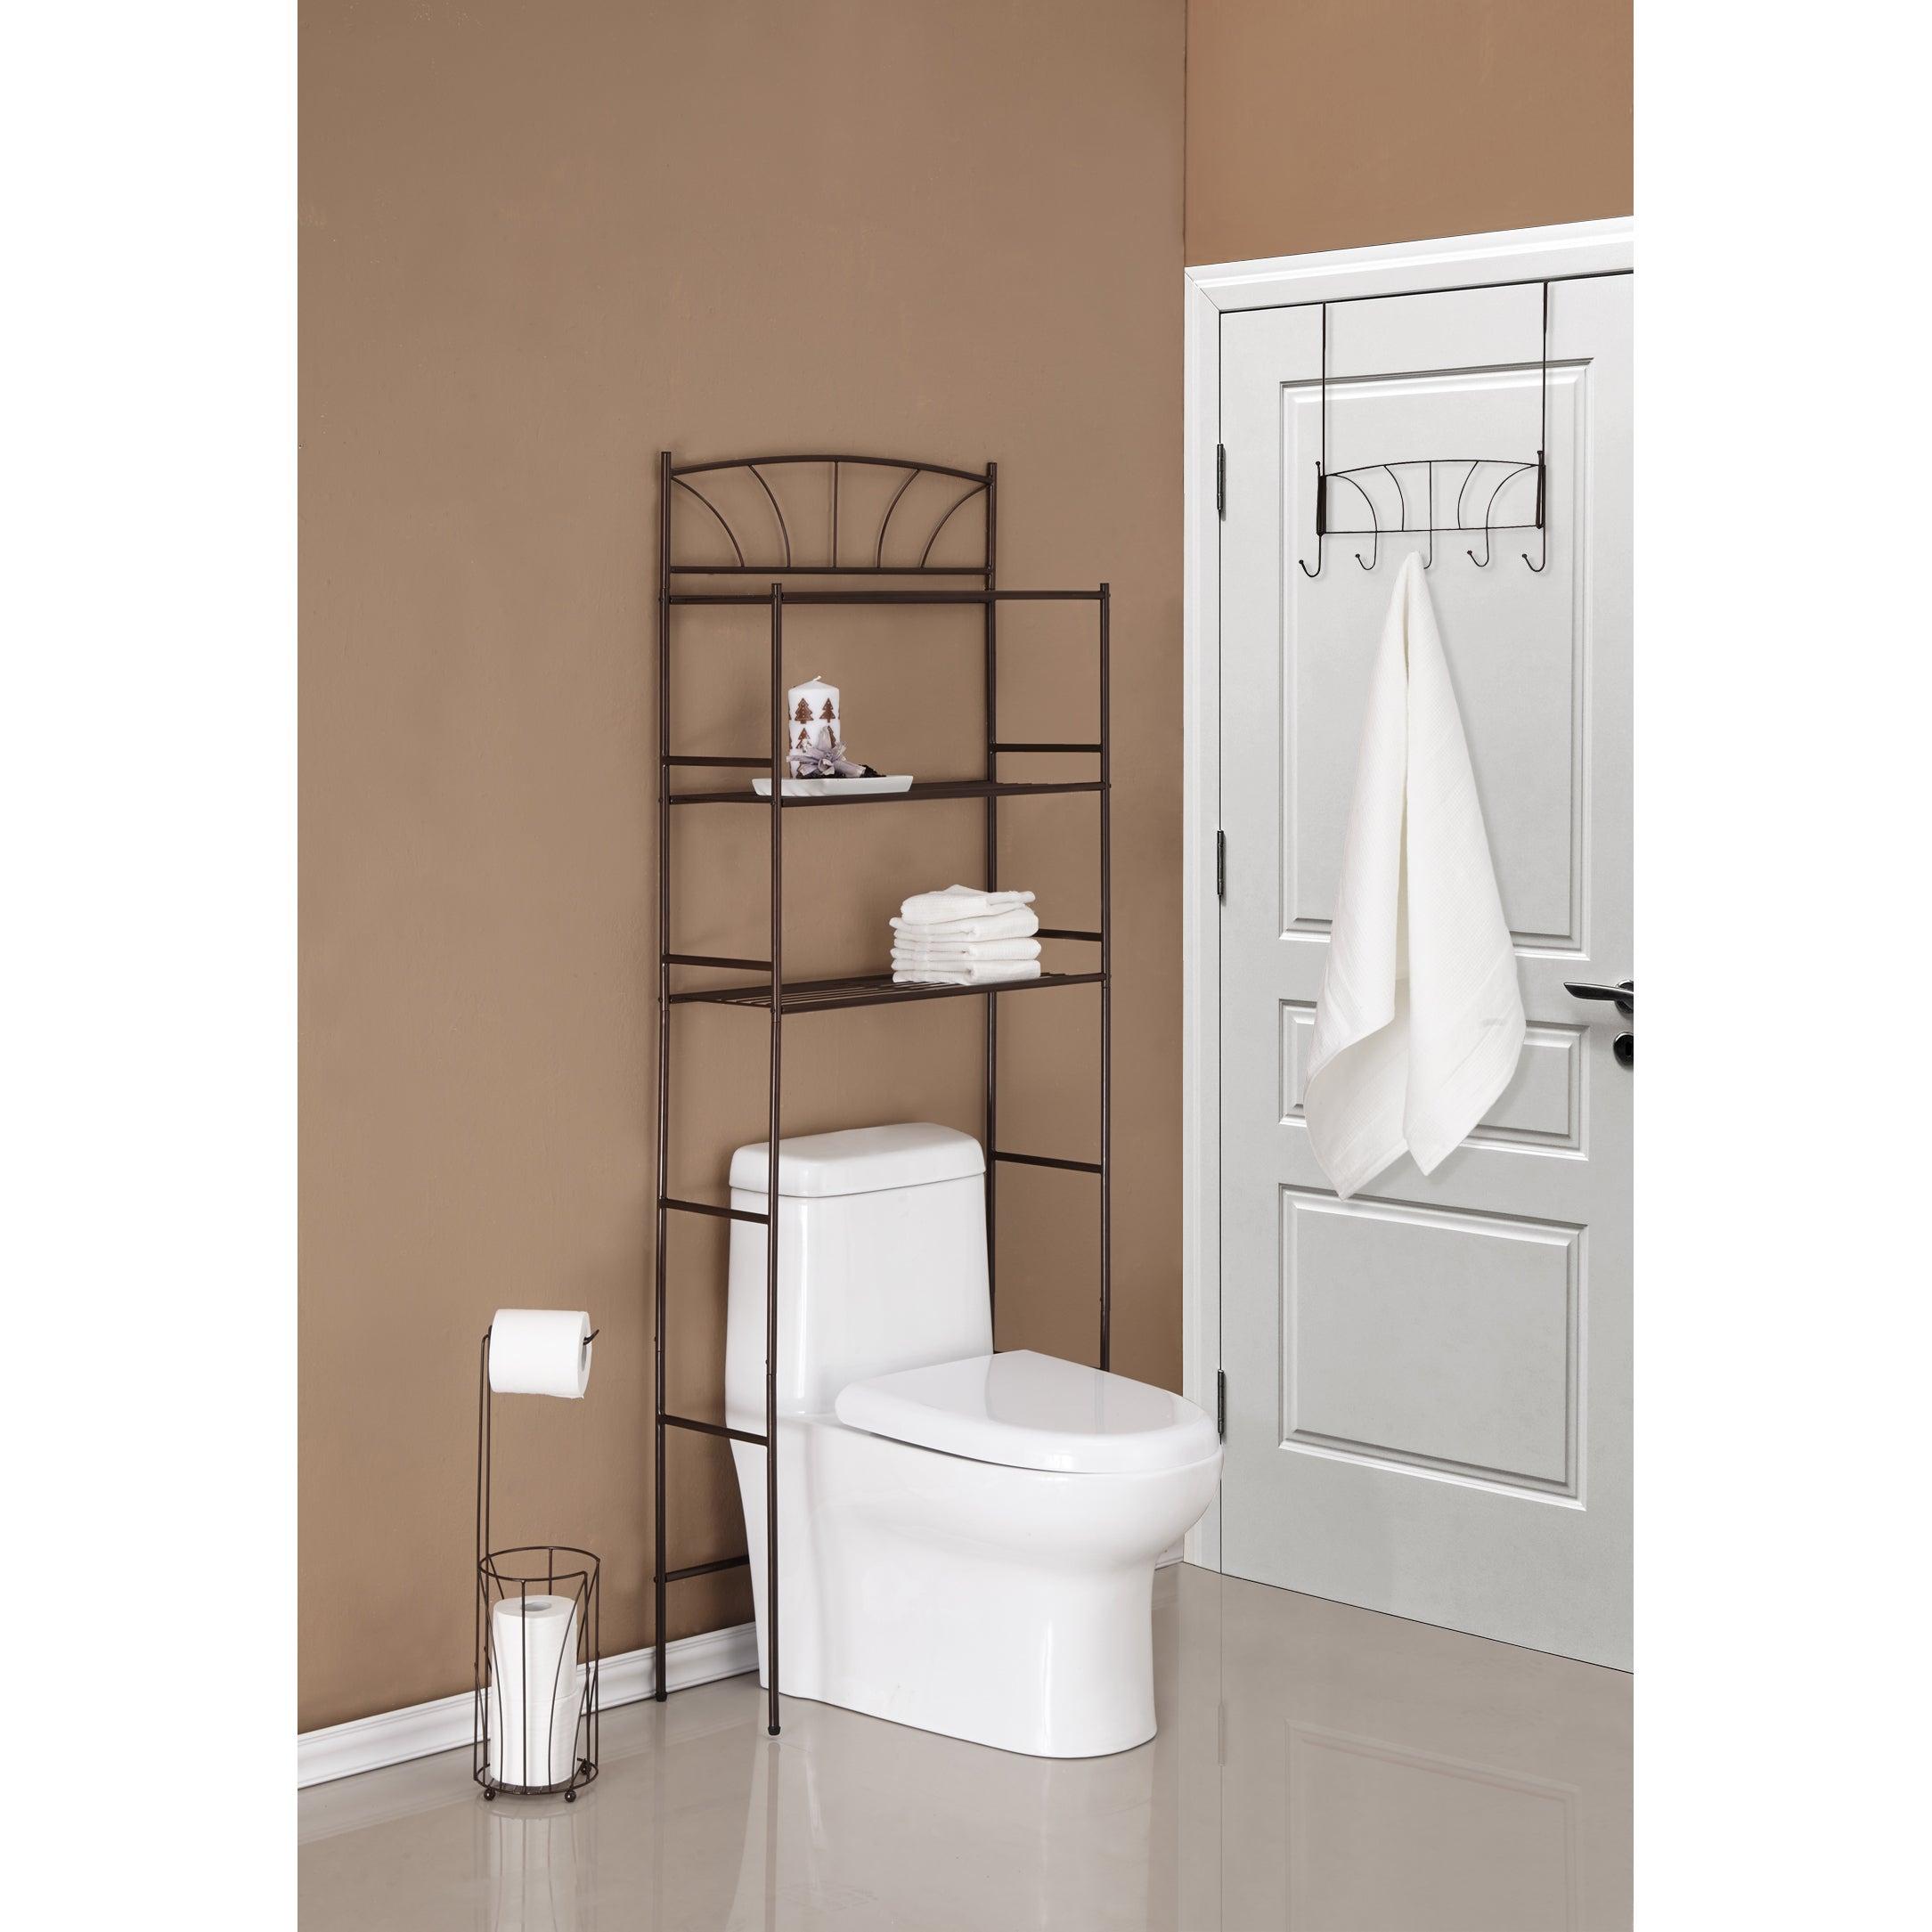 Three Piece Palm Design Combo Bathroom Storage Kit with regard to dimensions 2169 X 2169